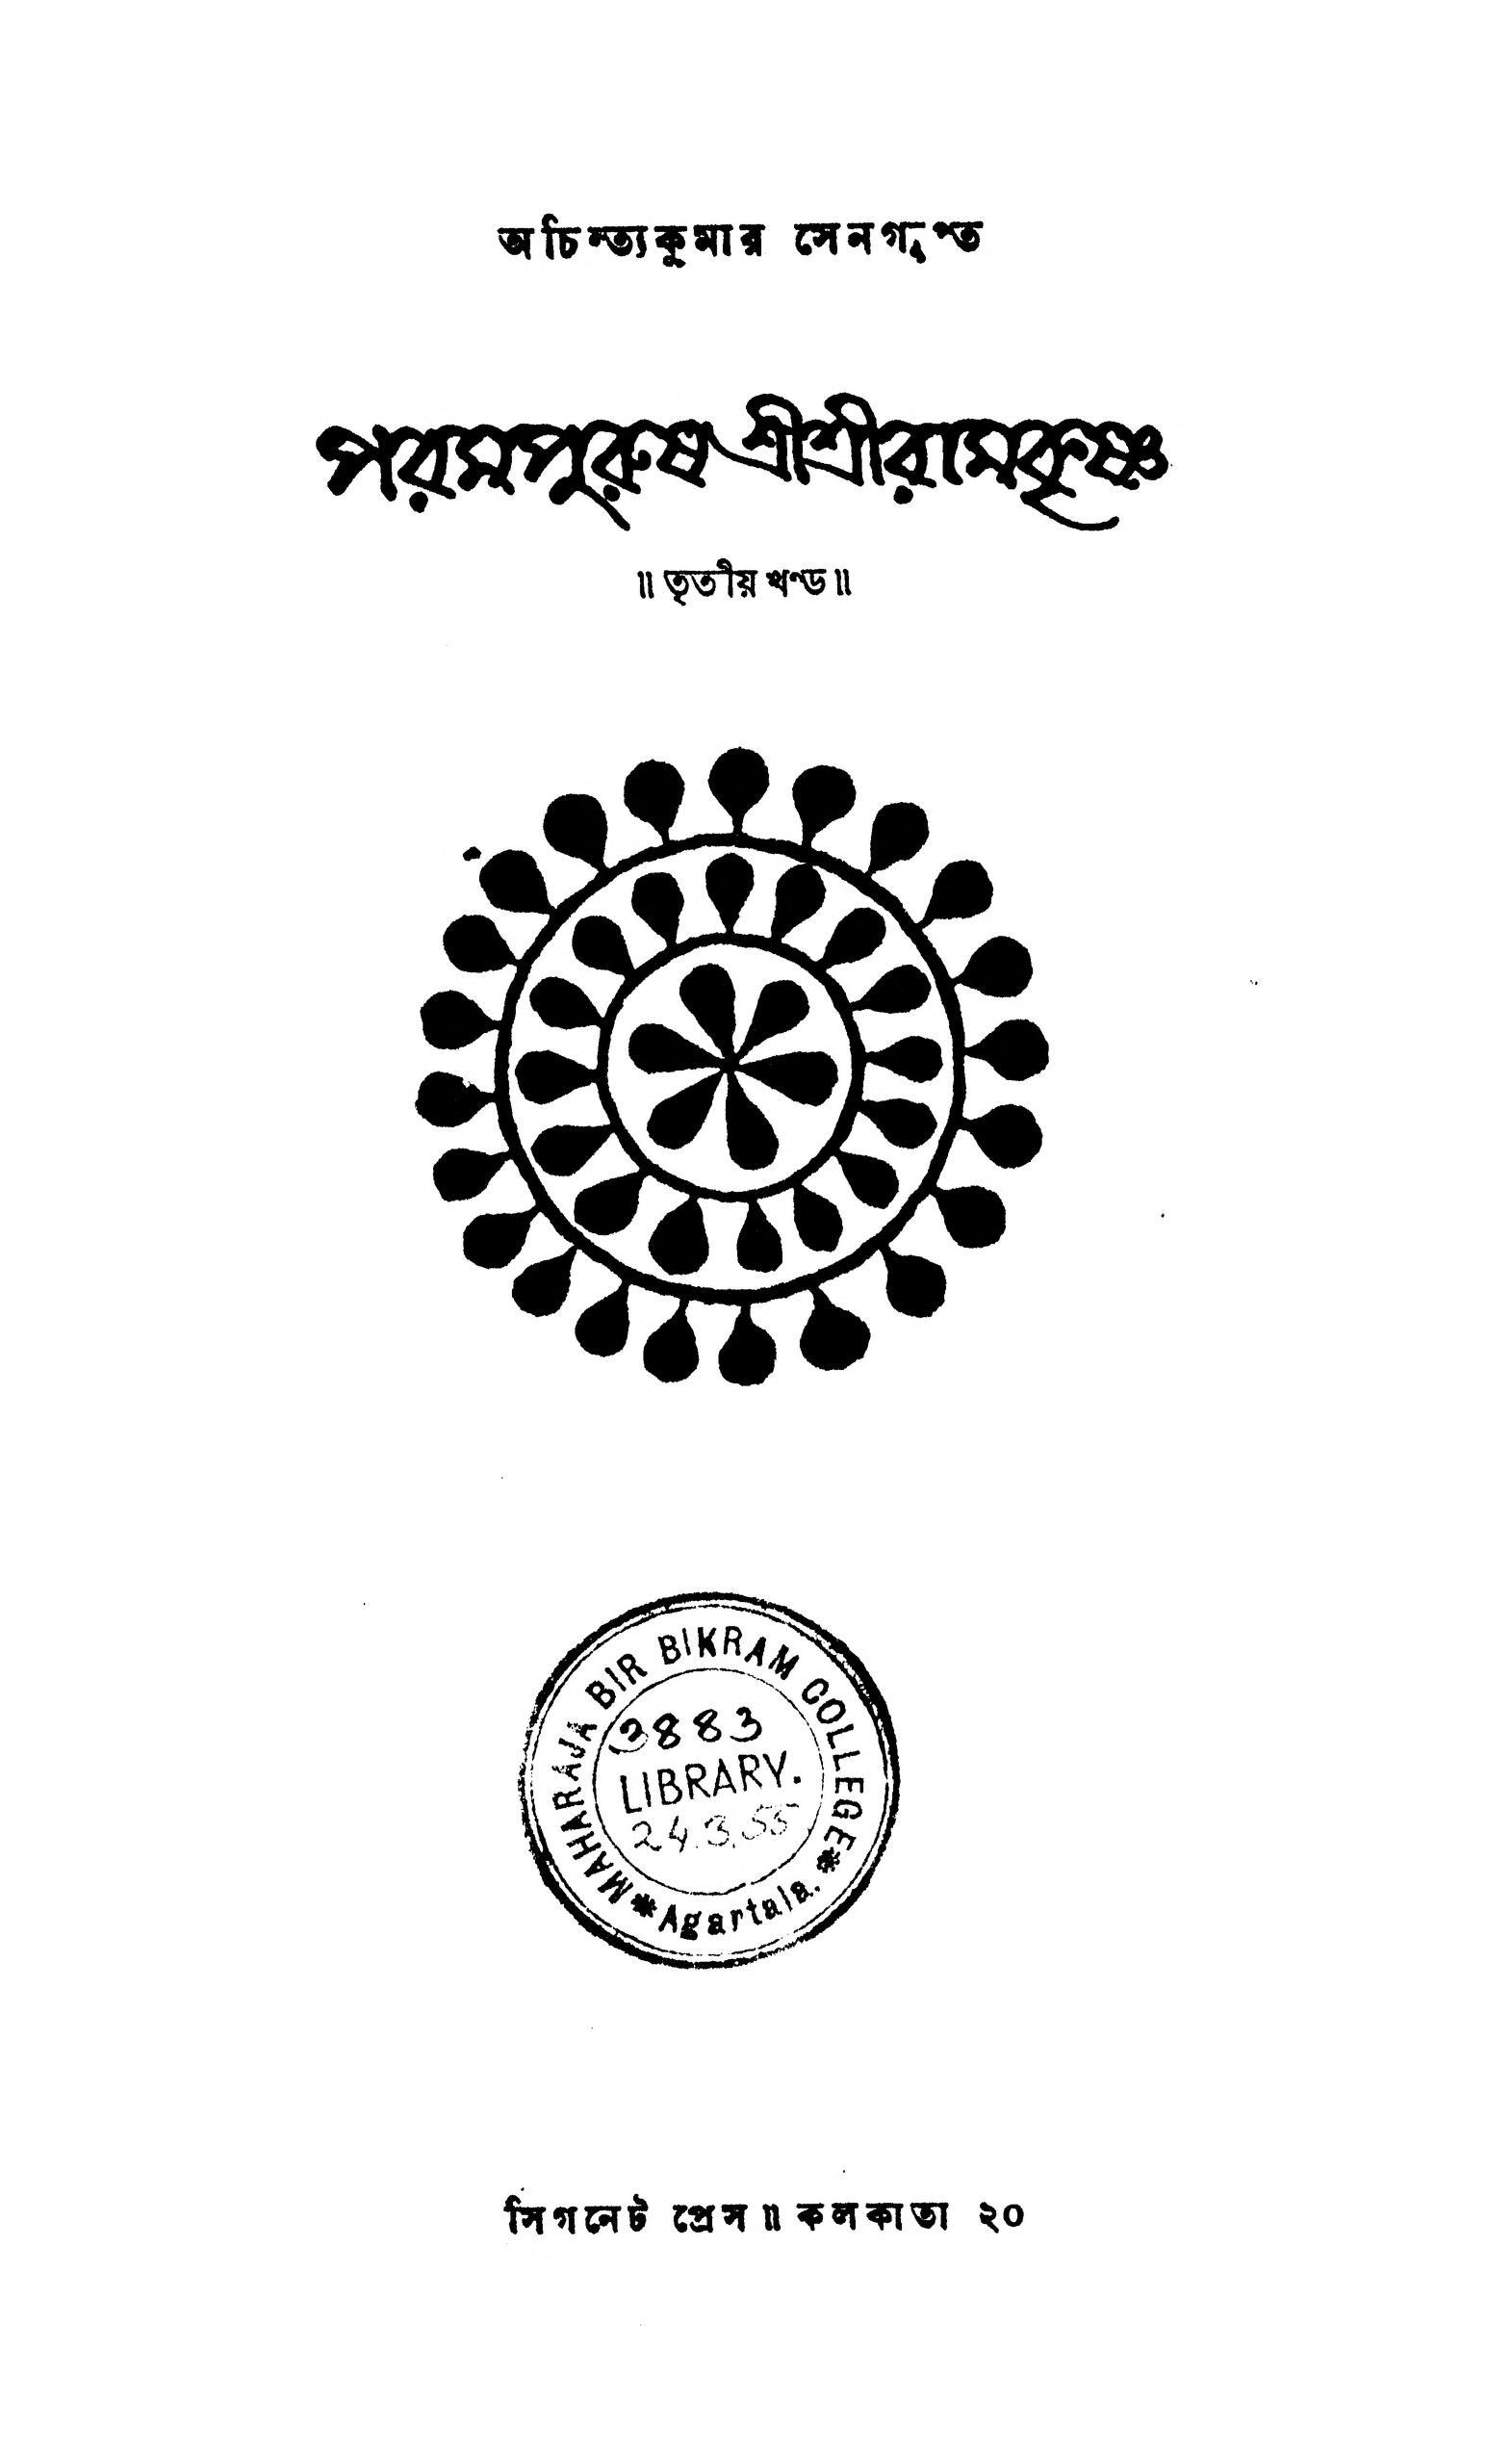 Book Image : পরমপুরষ শ্রীশ্রীরামকৃষ্ণ [খণ্ড-৩] - Parampurush Sri Sri Ramkrishna [Vol. 3]